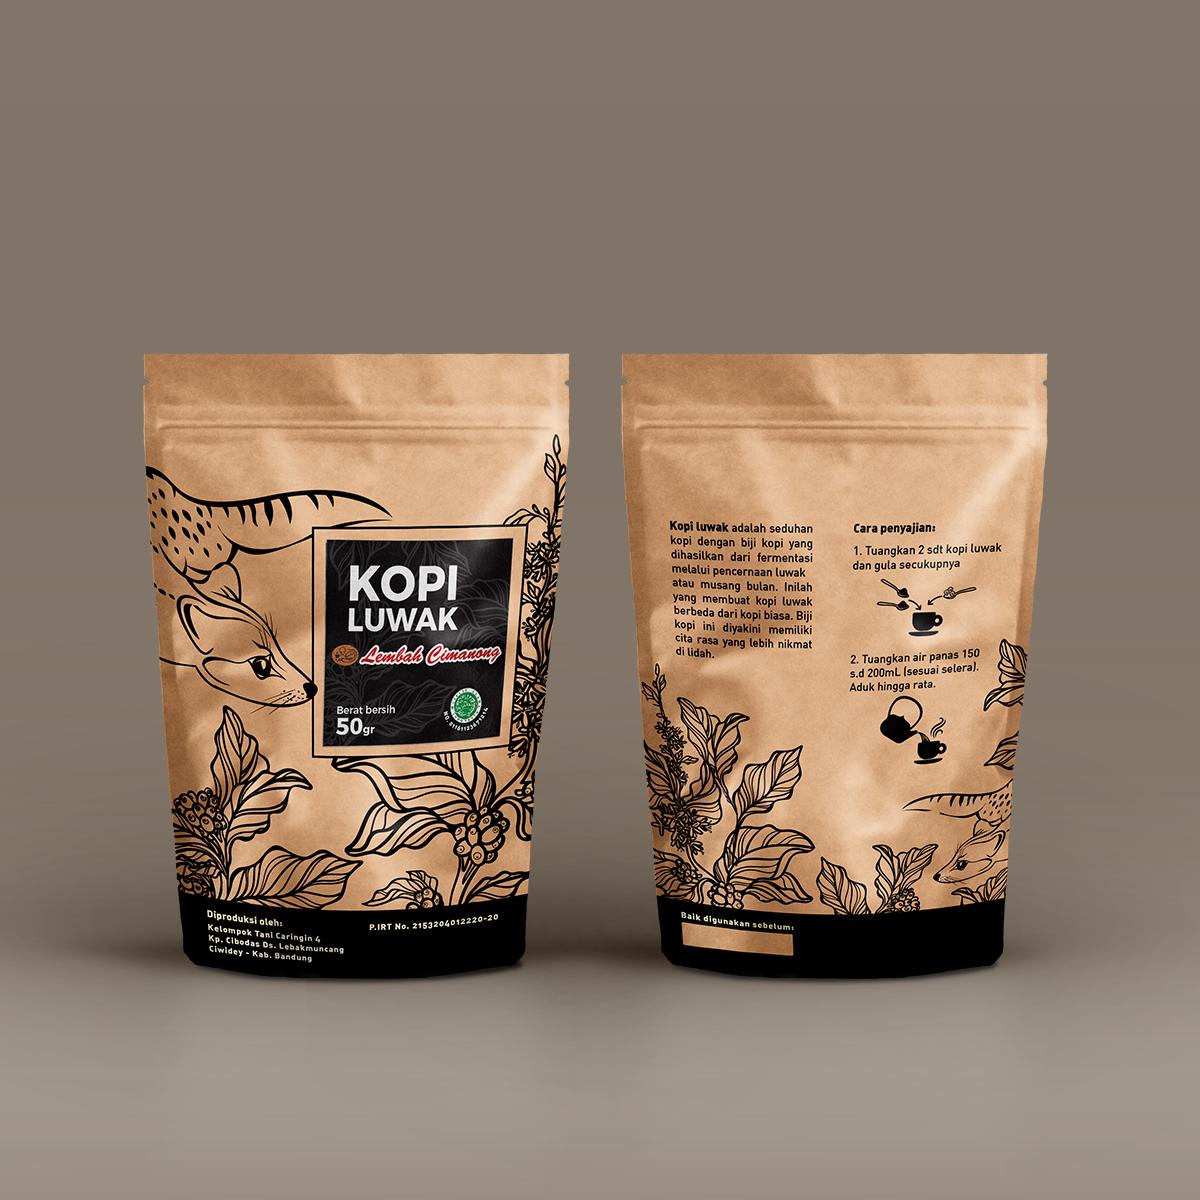 Civet Coffee Kopi Luwak From Firebox Packaging Lembah Cimanong 250 Gram By On Student Show